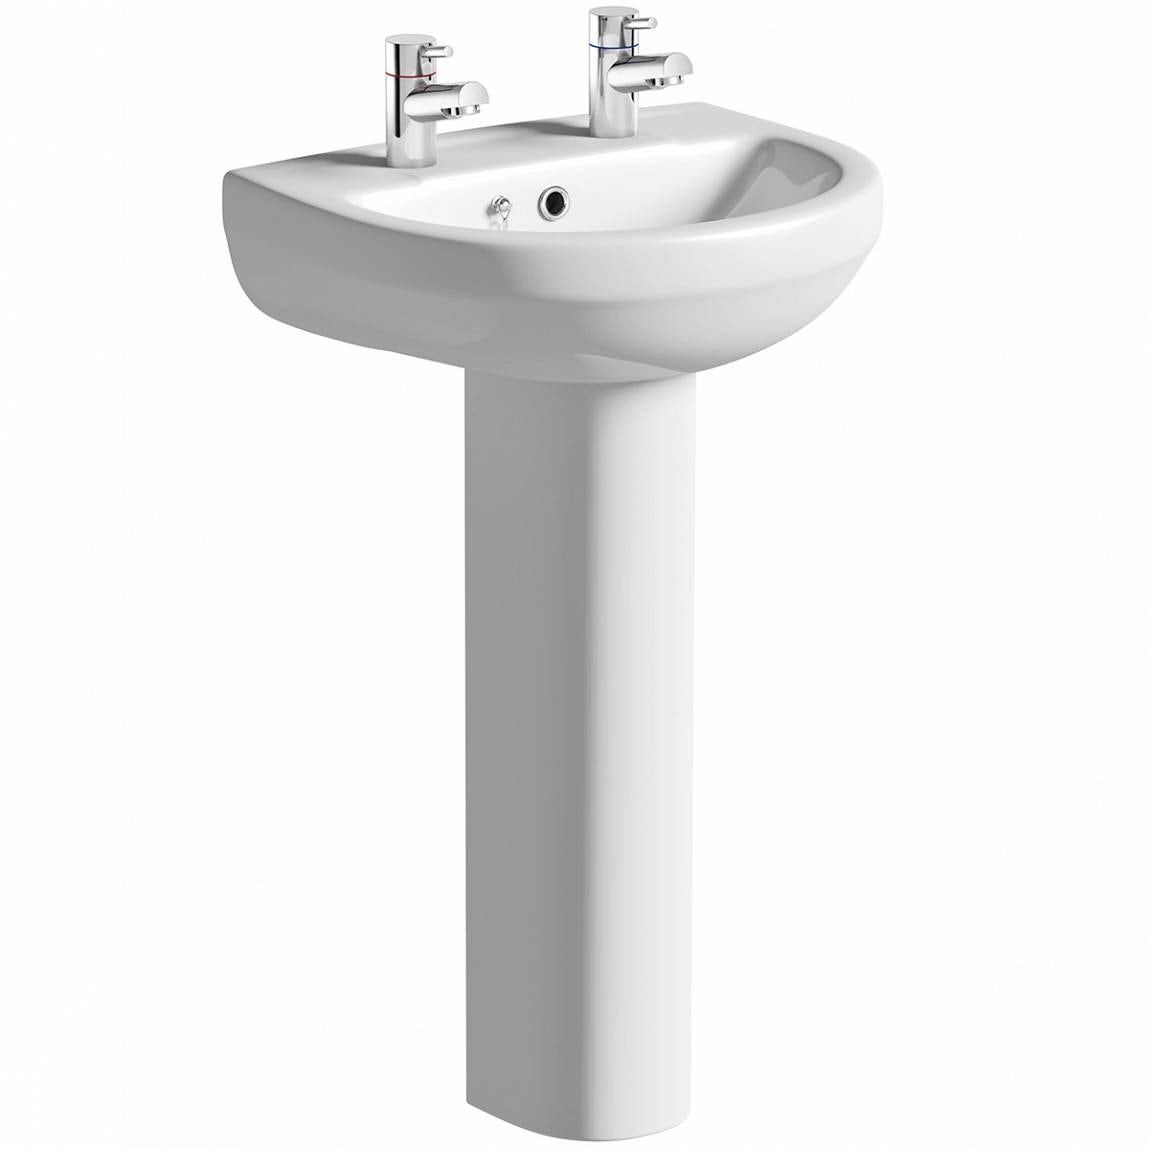 Eden 2 tap hole full pedestal basin